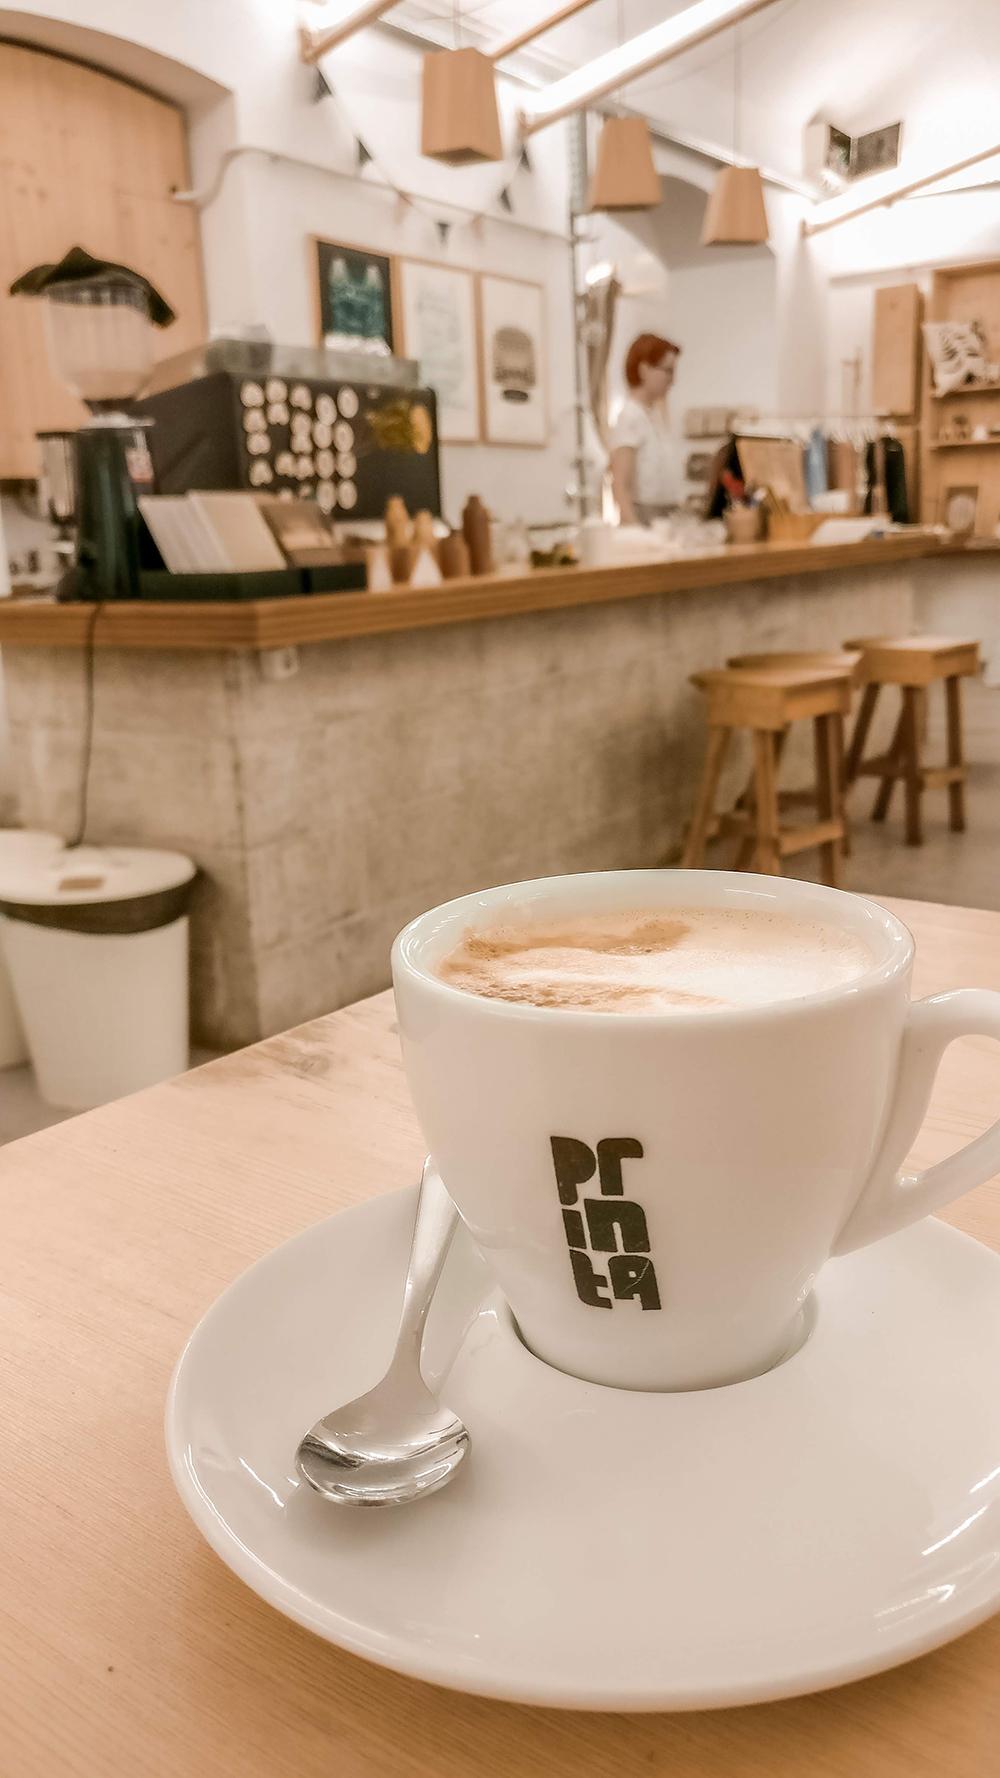 Enjoy a coffee in Printa Design Shop - Budapest design shop guide to best Hungarian souvenirs | Aliz's Wonderland